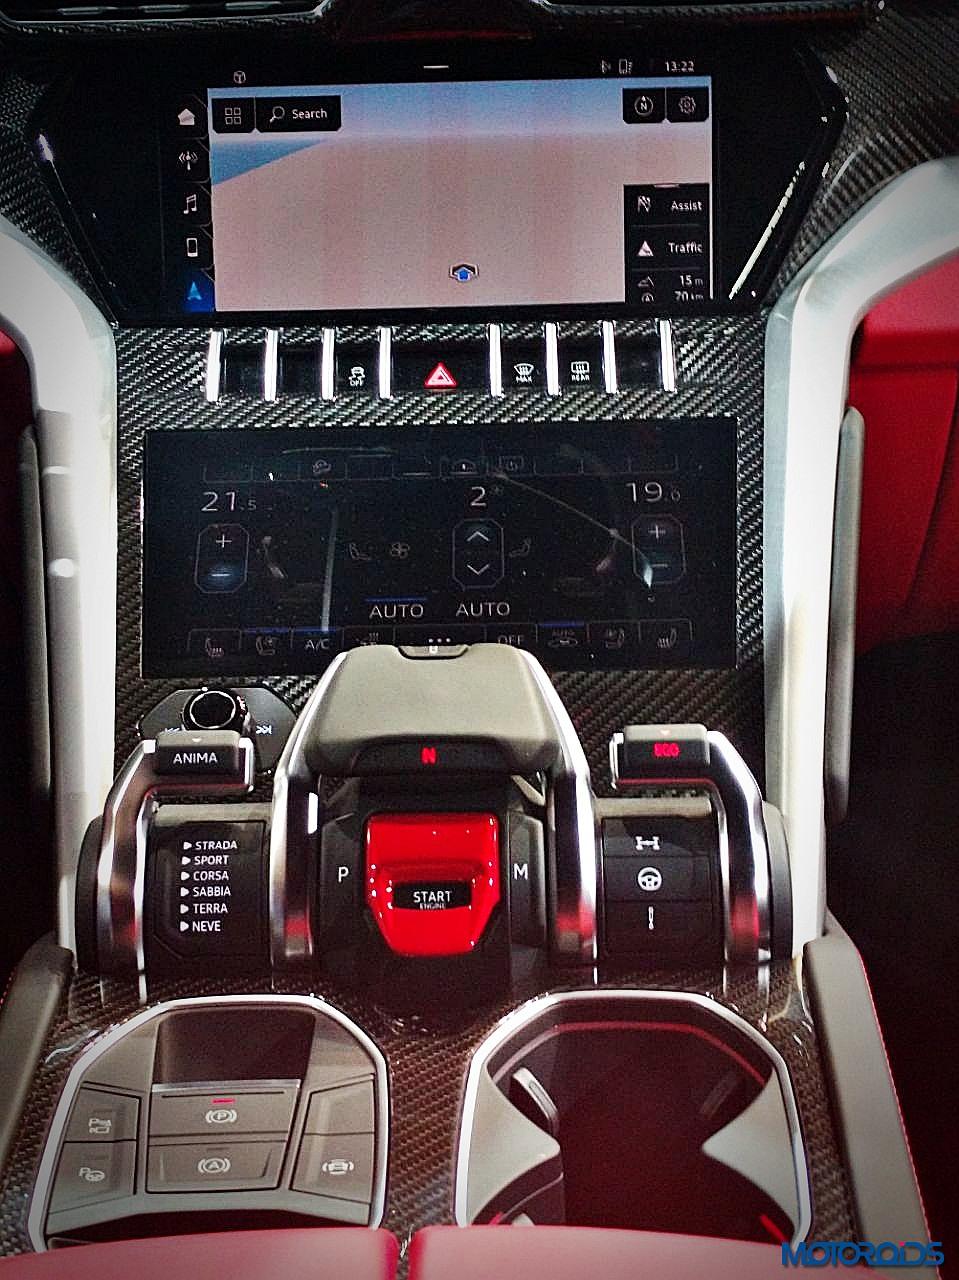 Lamborghini Urus India Launch Official Release Features Price And Image Gallery Motoroids